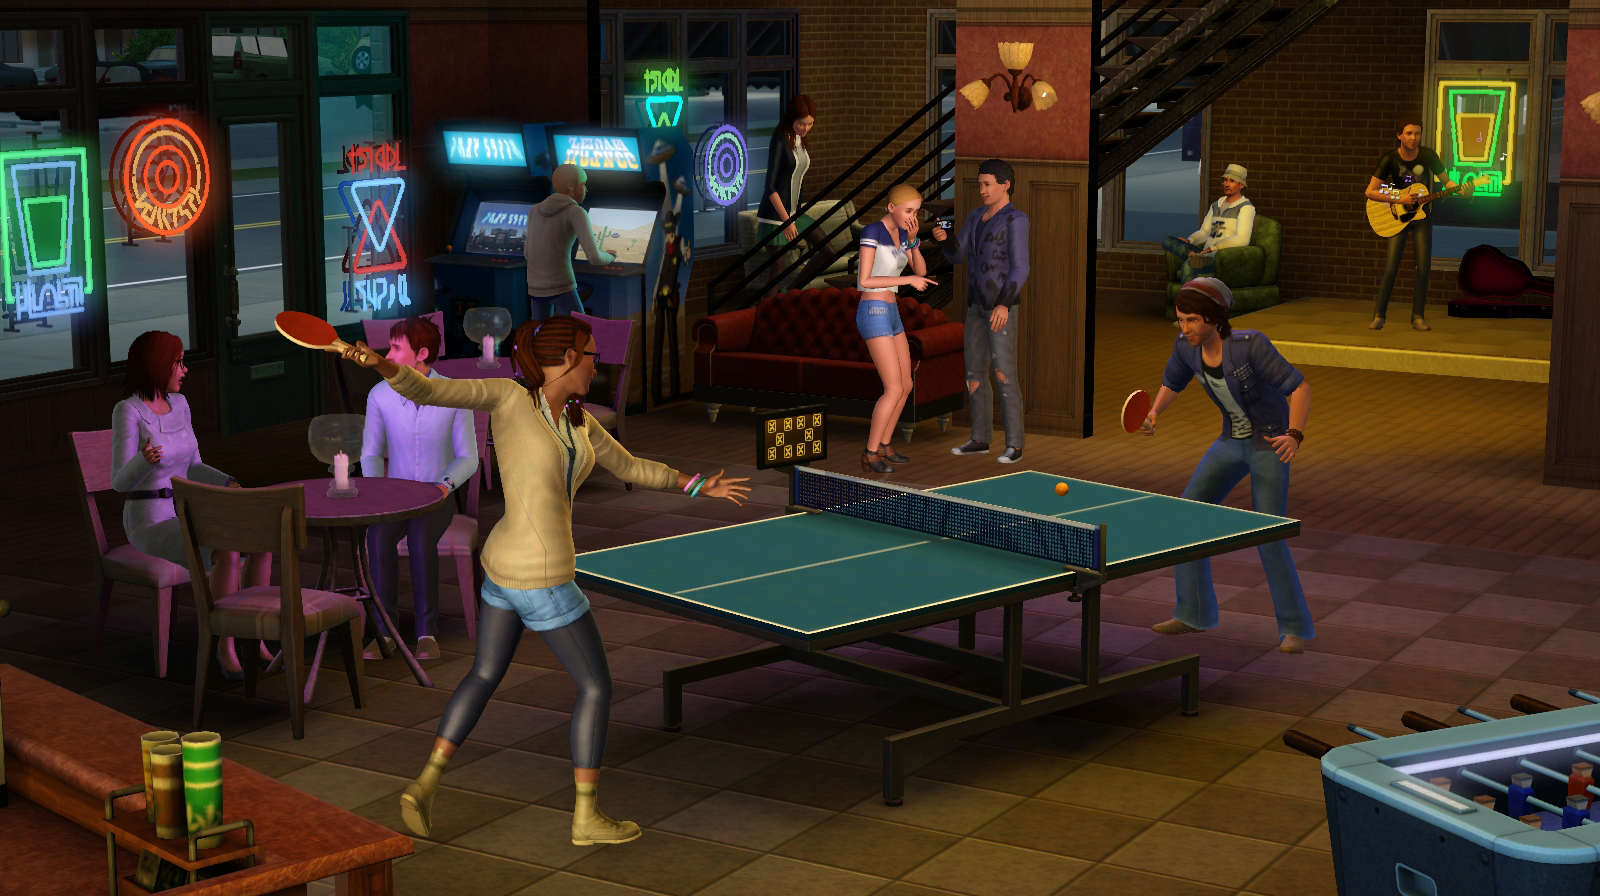 The Sims 2 University life setup free download